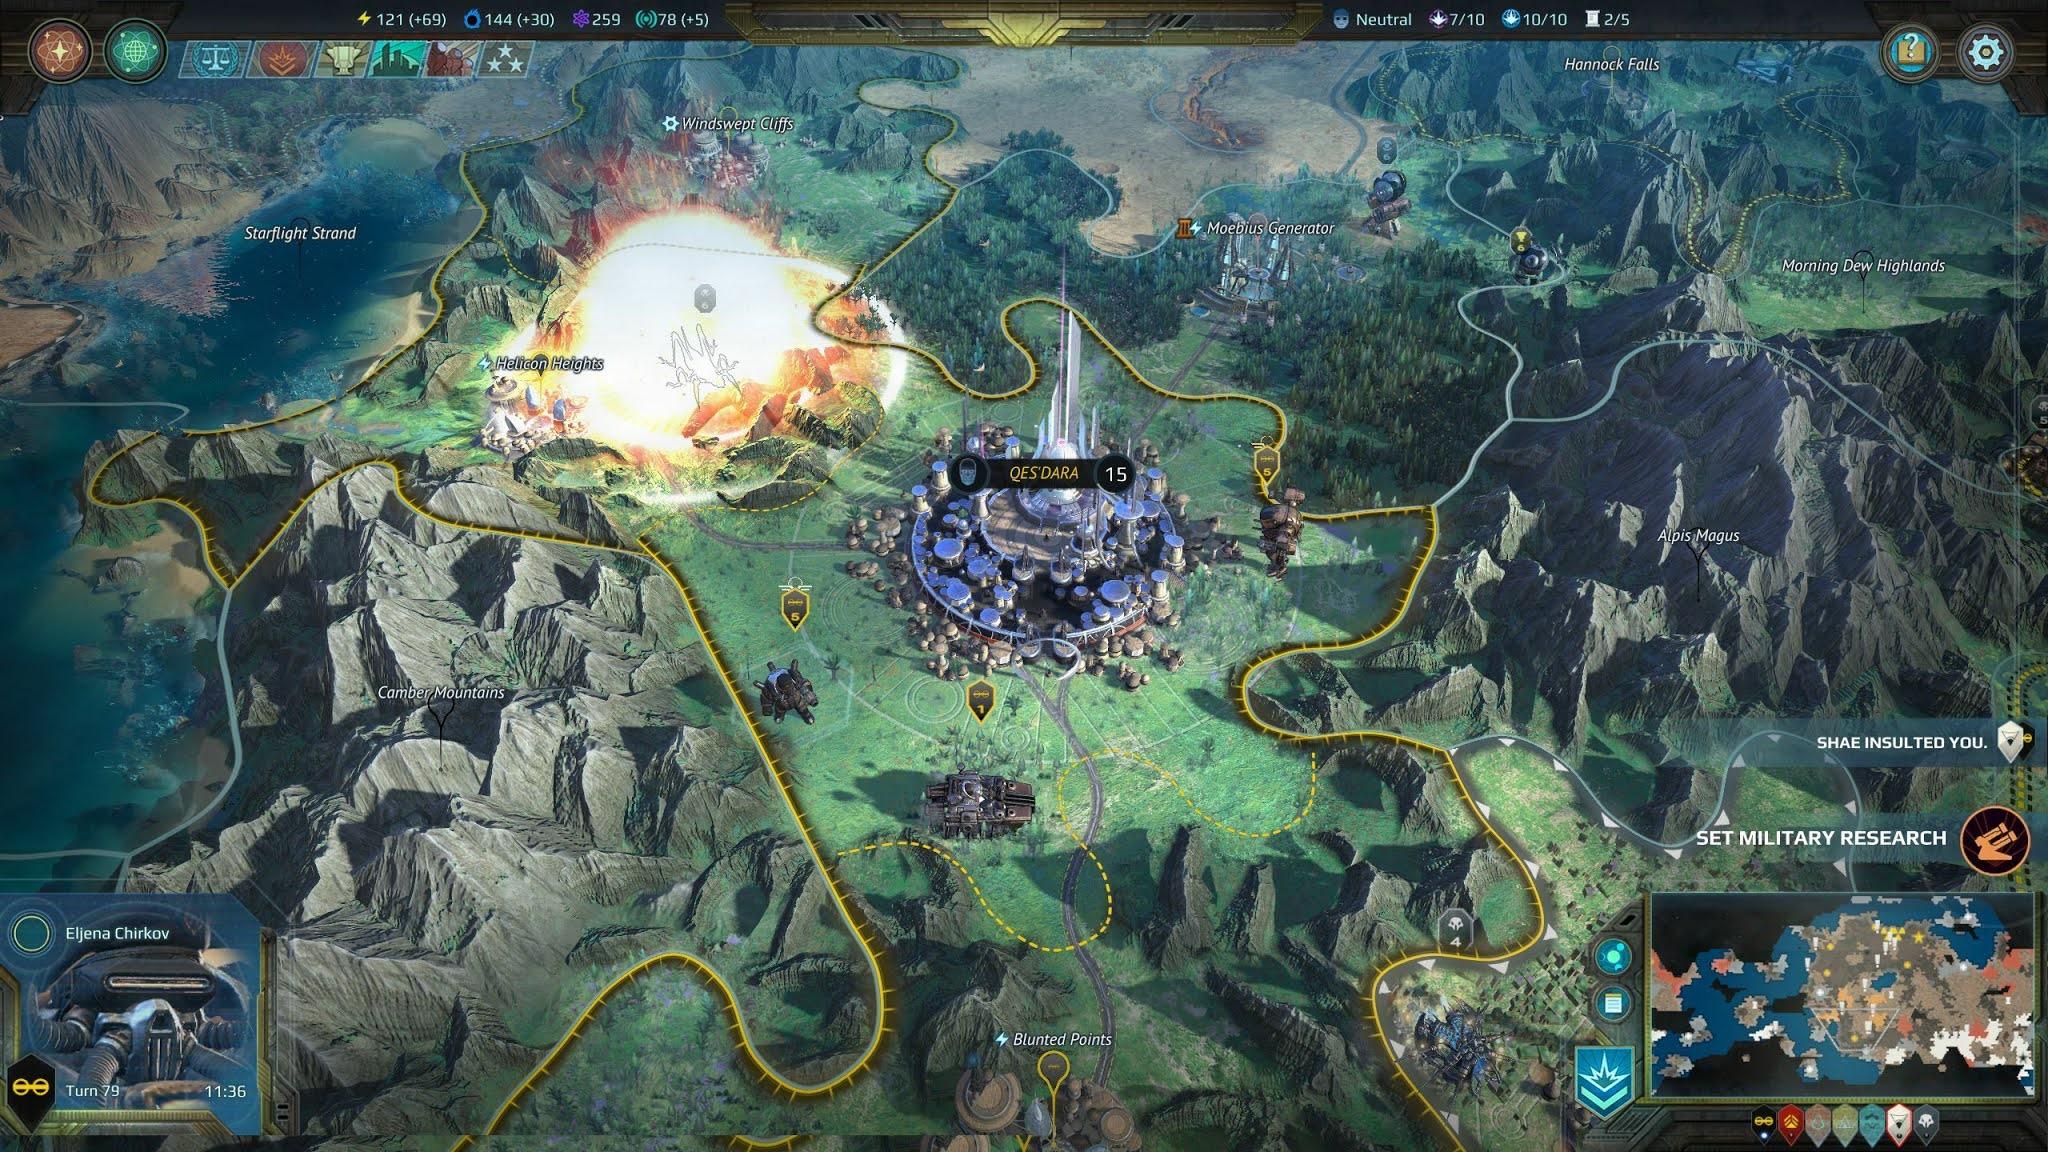 age-of-wonders-planetfall-premium-pc-screenshot-01